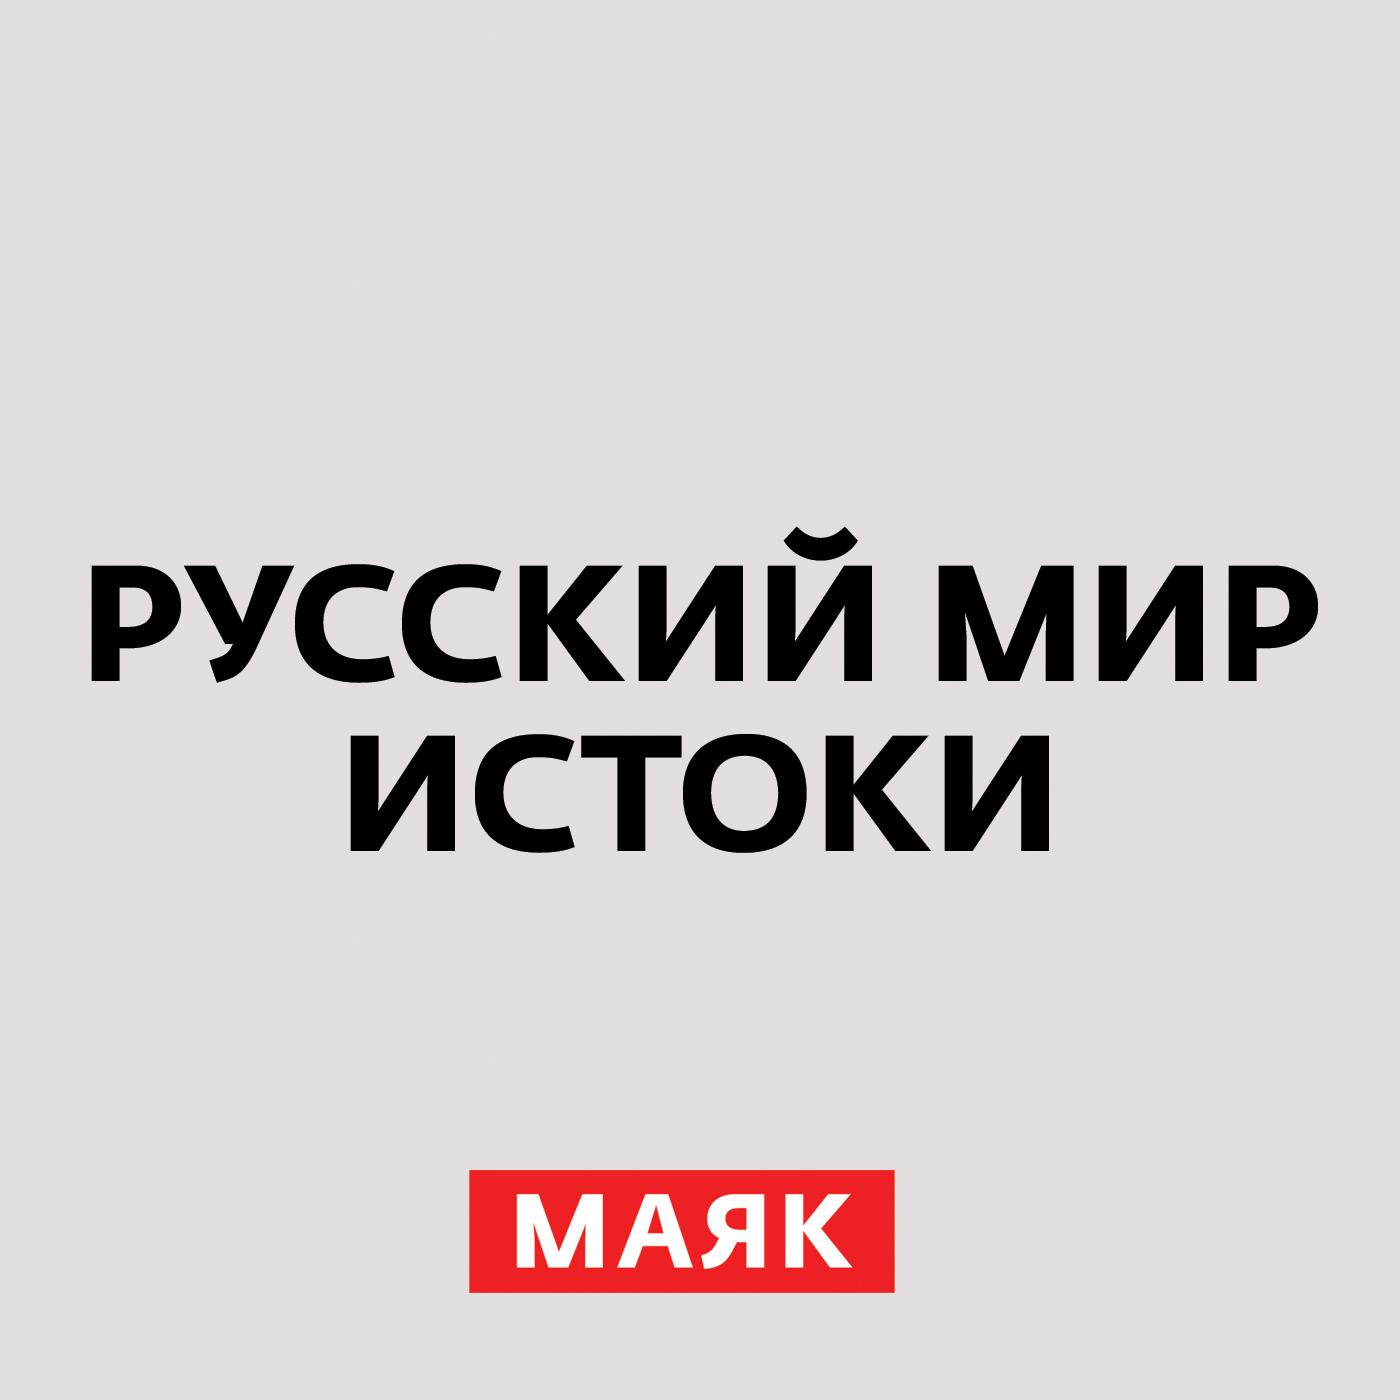 Творческий коллектив радио «Маяк» Святополк (Михаил) Изяславич творческий коллектив радио маяк великий князь ярослав